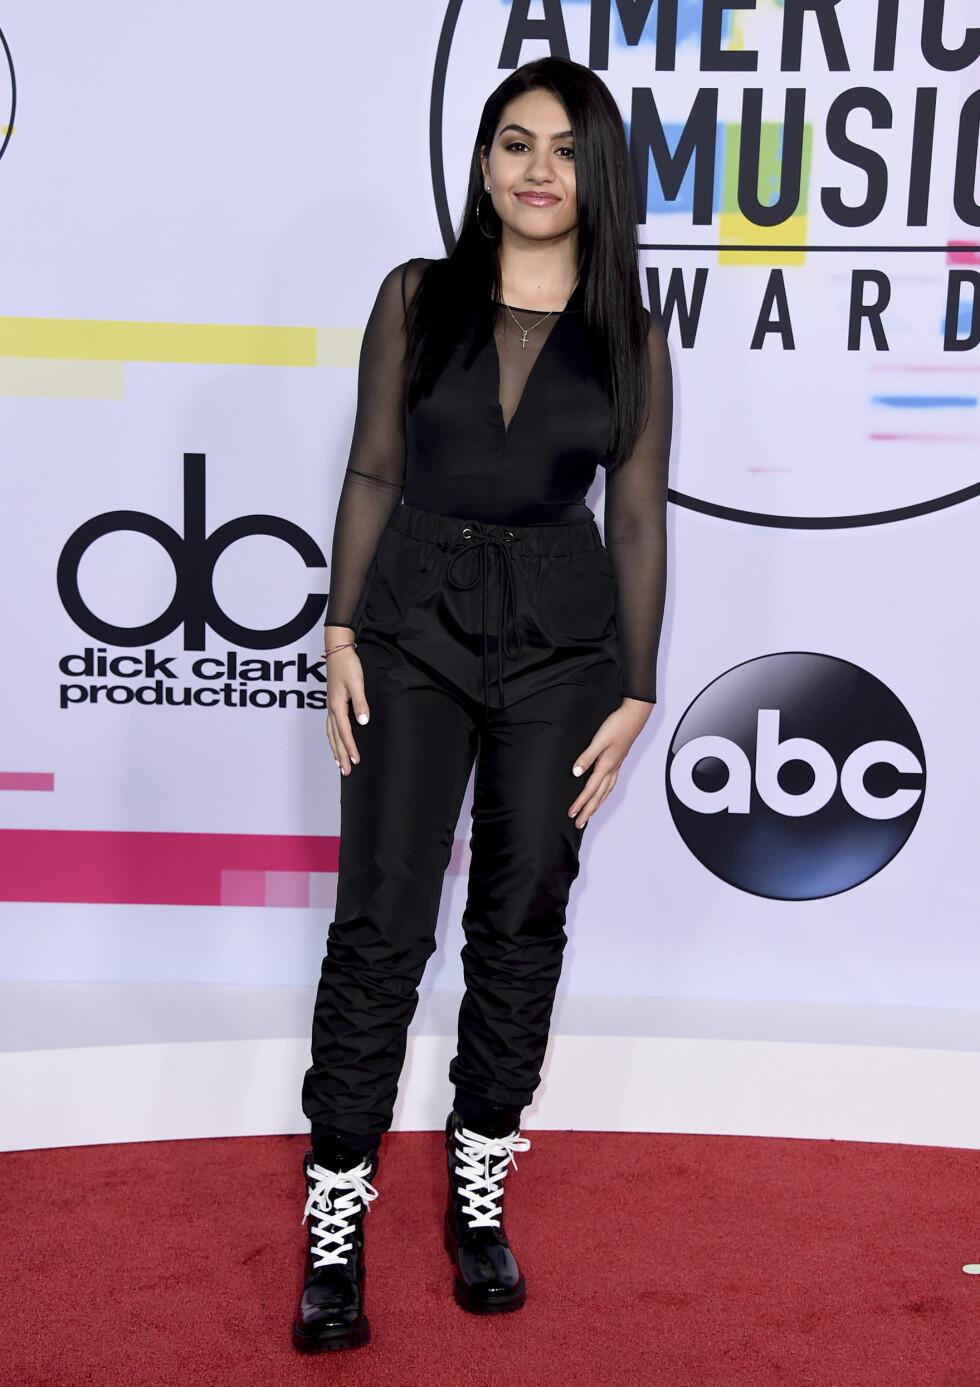 AMERICAN MUSIC AWARDS: Alessia Cara